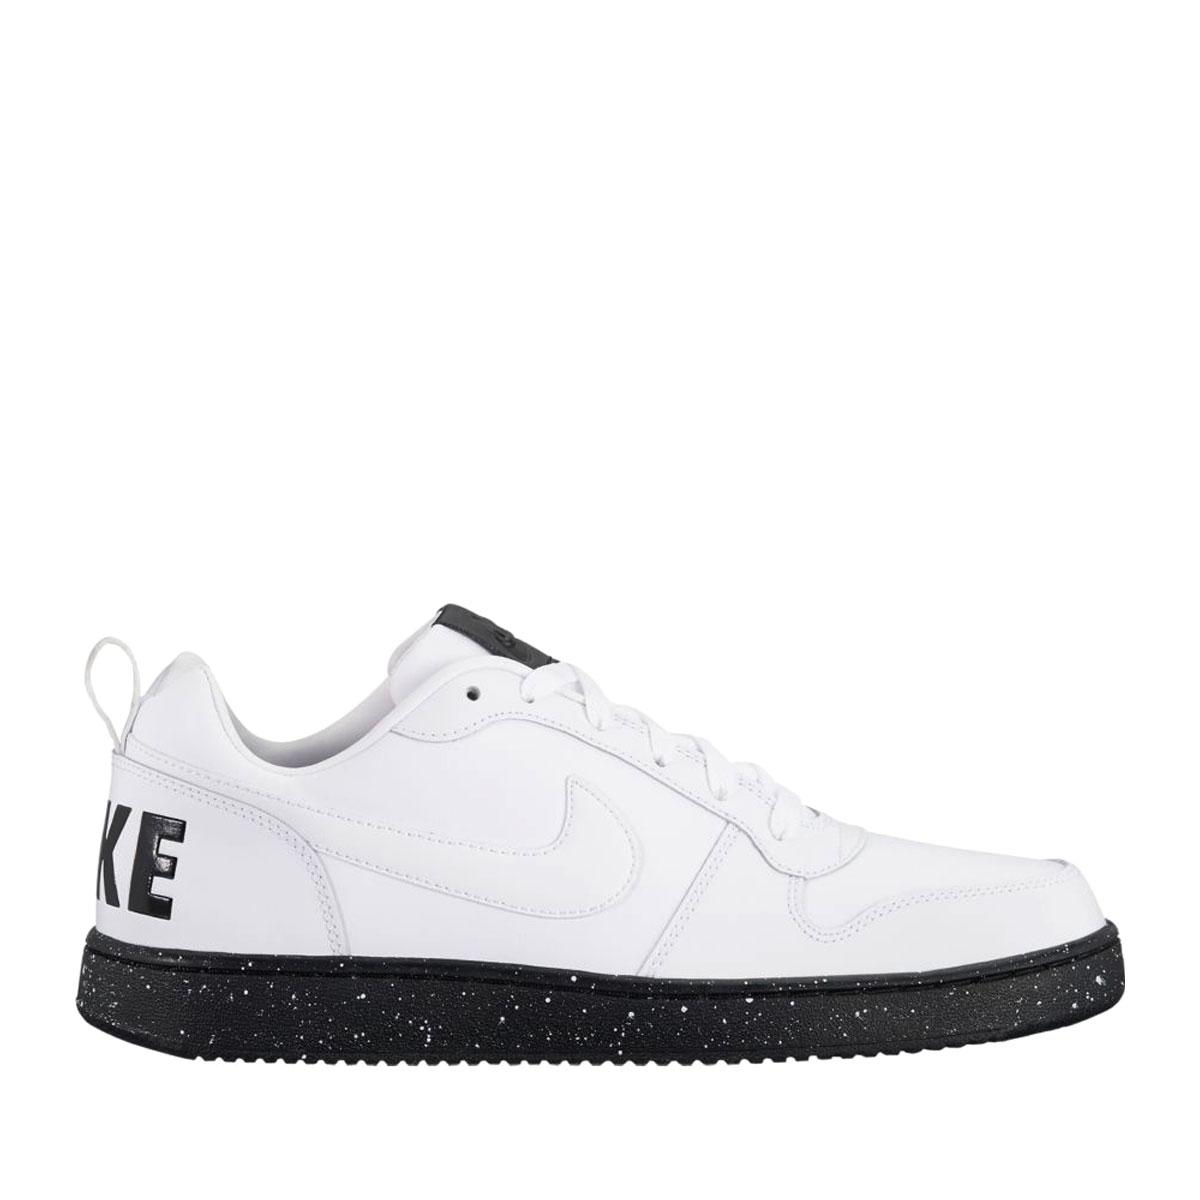 72719b38 Кроссовки Nike Court Borough Low 916760-100 (Оригинал) - Football Mall -  футбольный